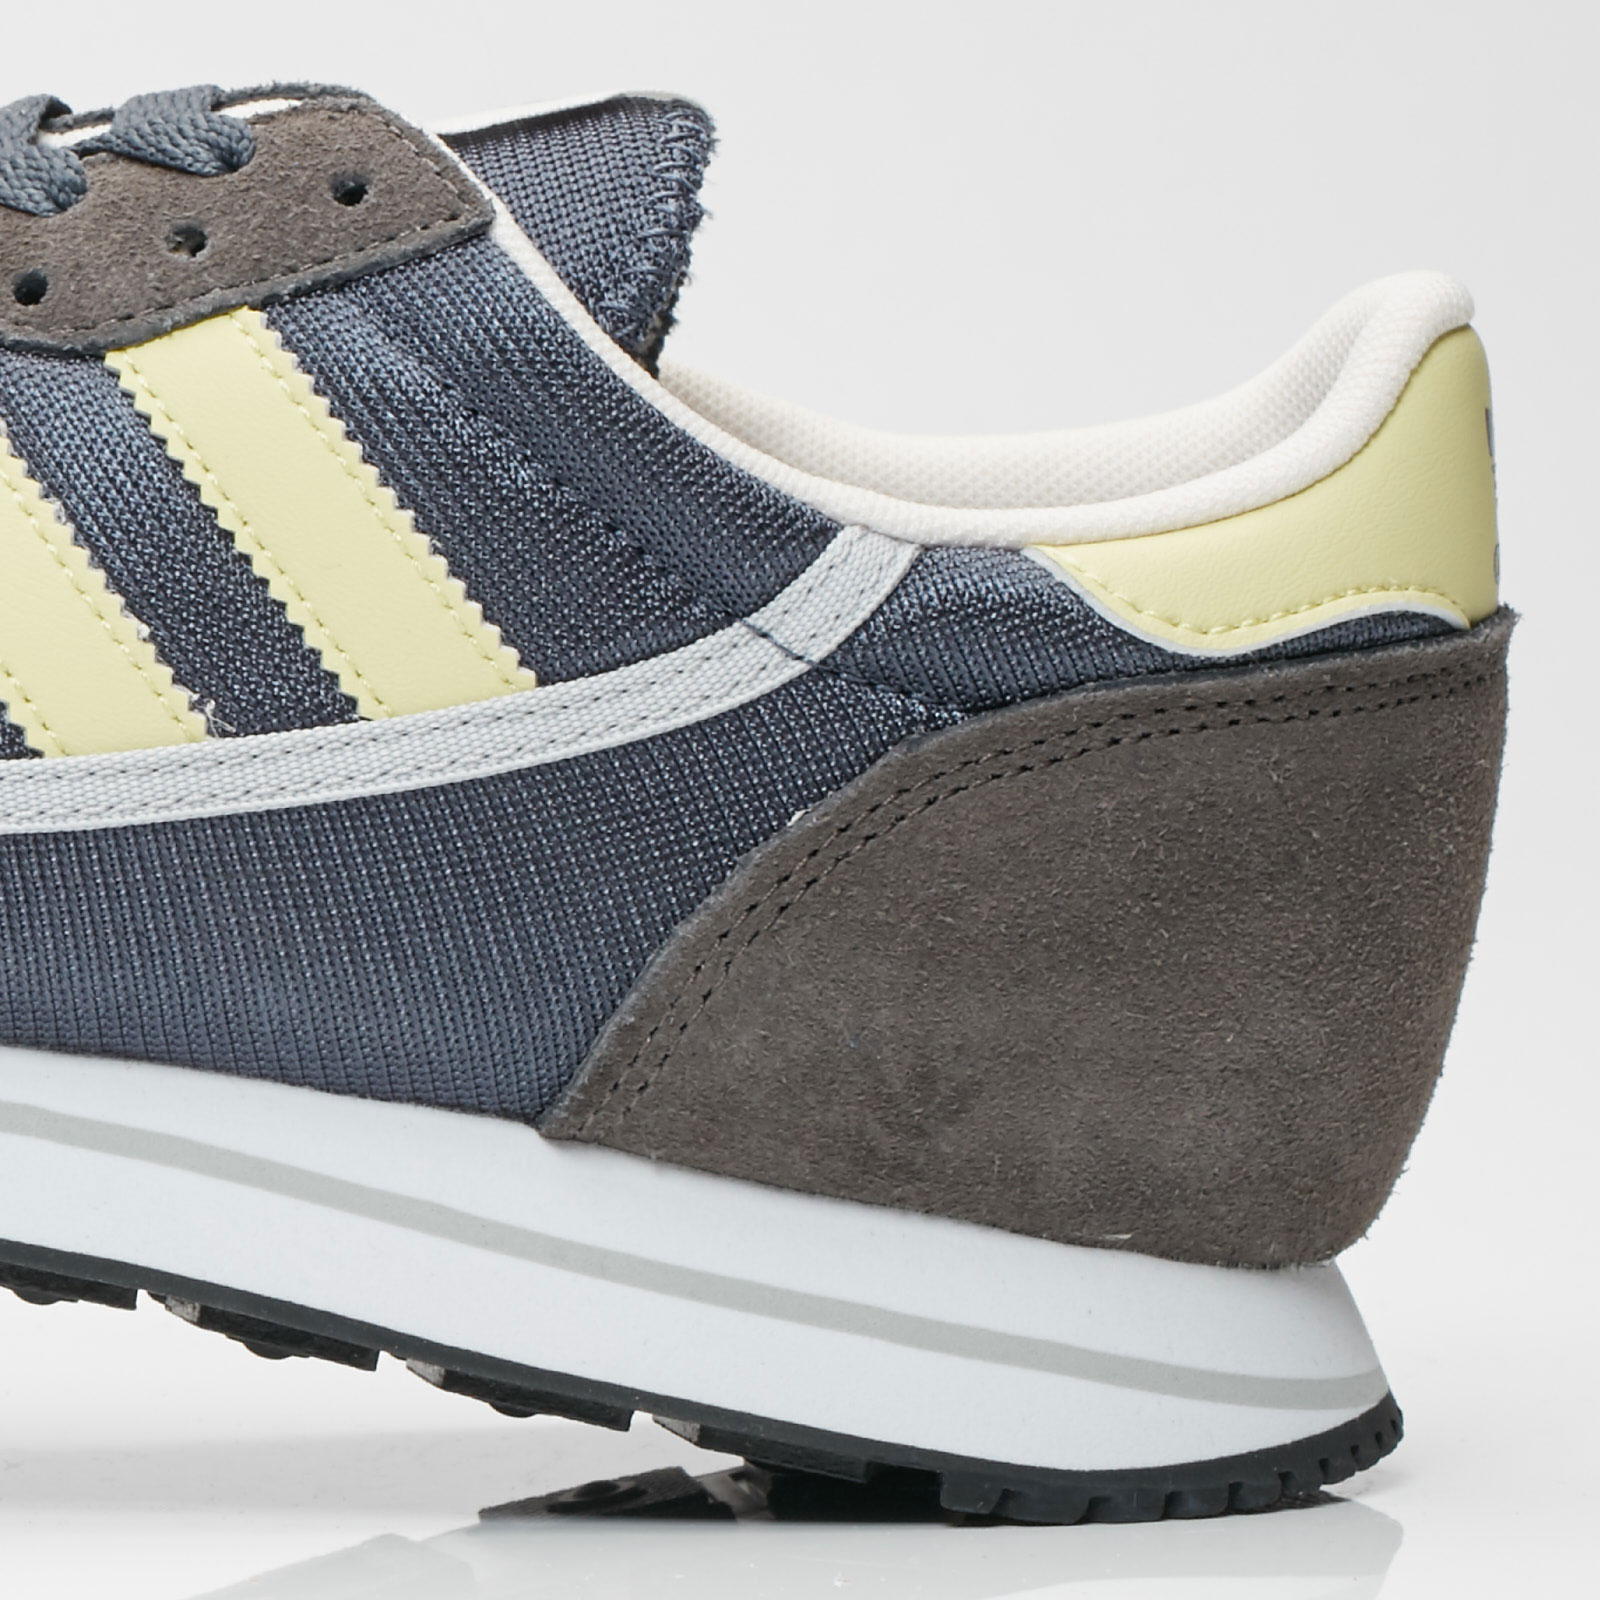 adidas zx 280 spzl shoes